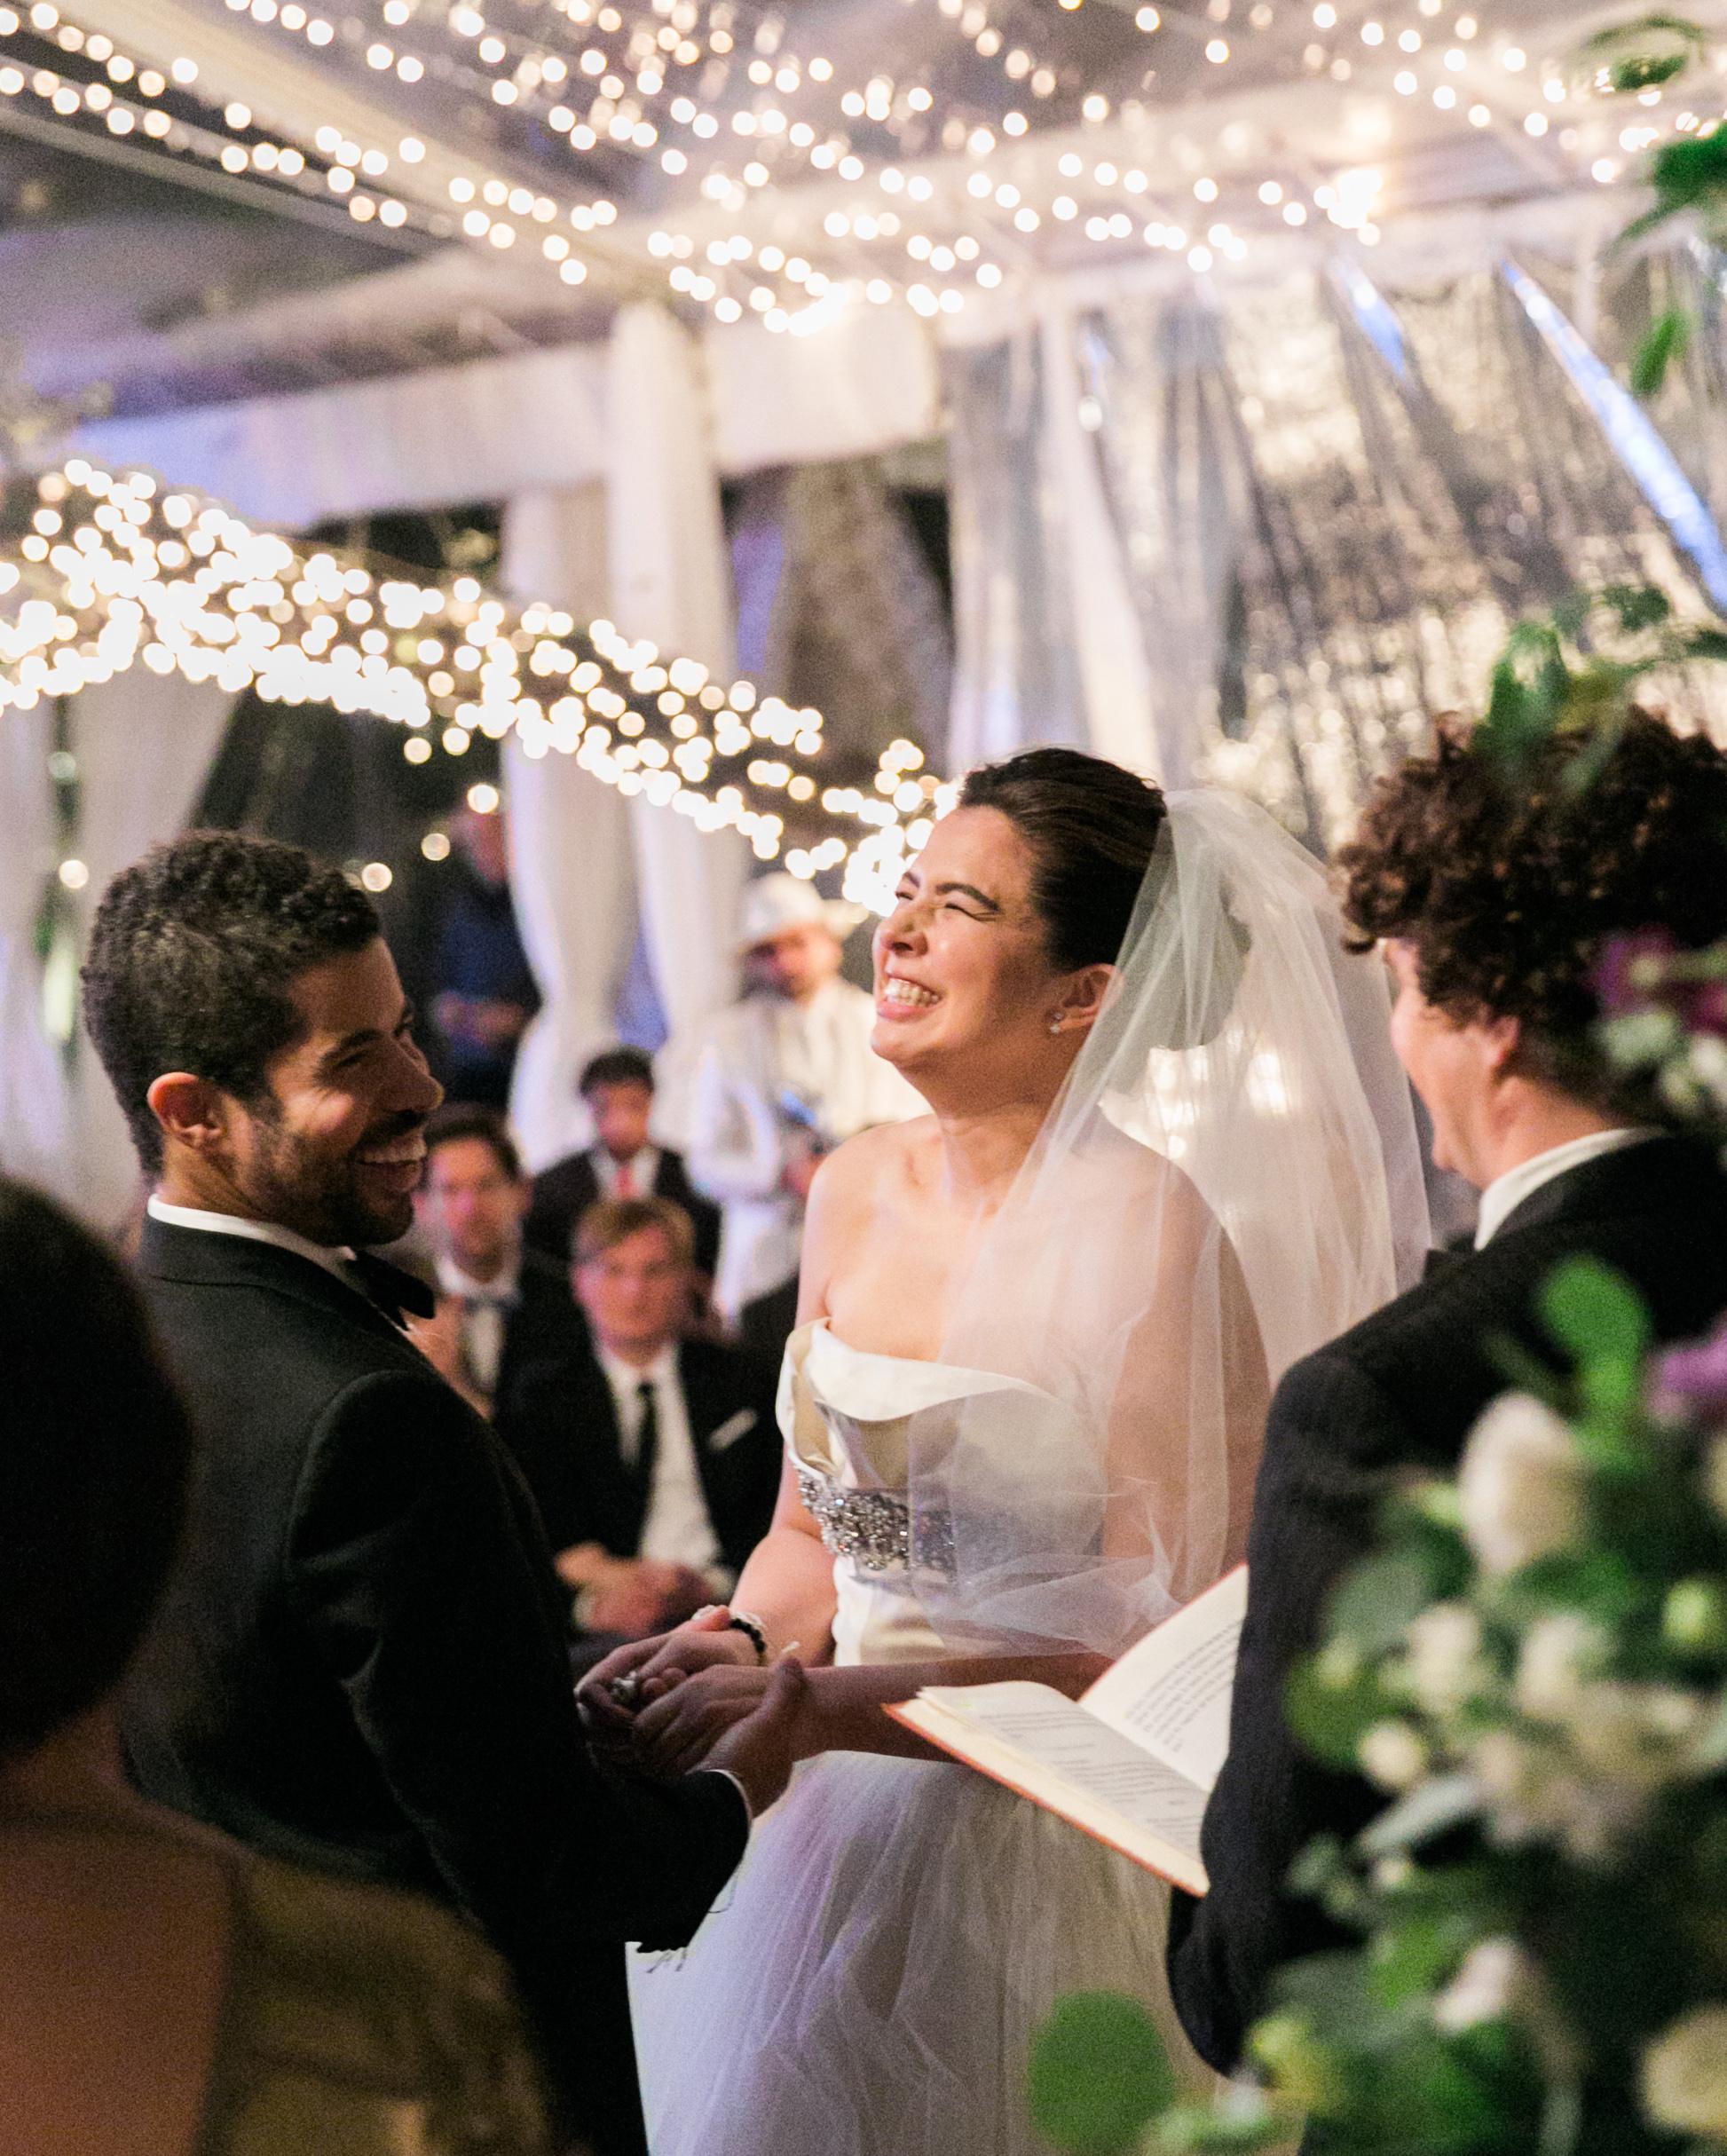 stacey-adam-wedding-ceremony-0084-s112112-0815.jpg